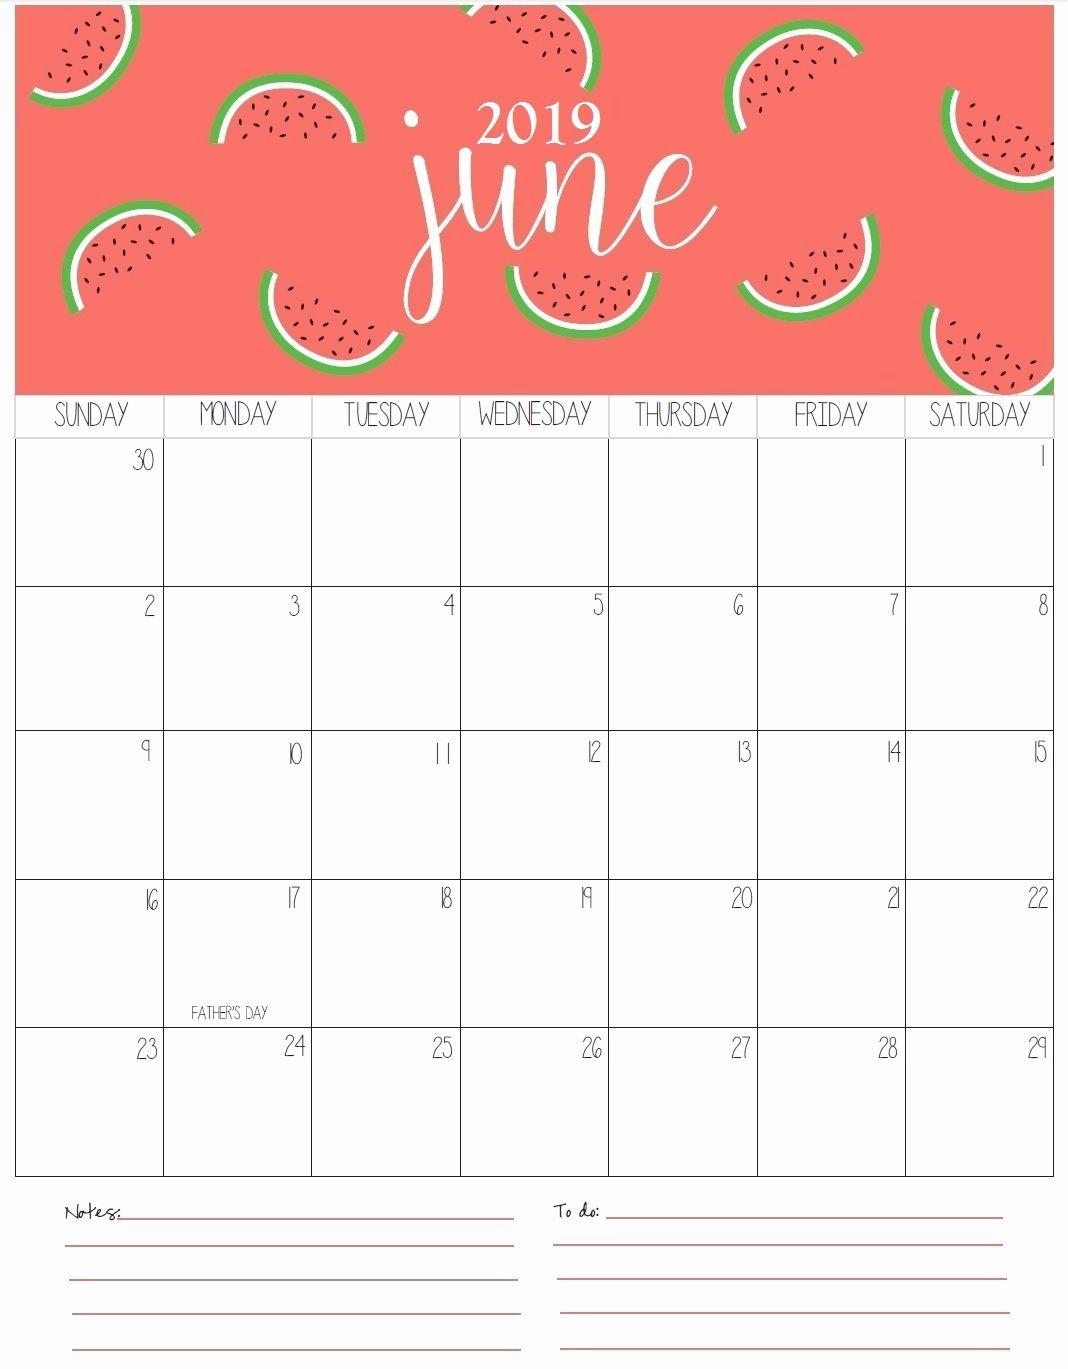 Holidays Calendar June 2019